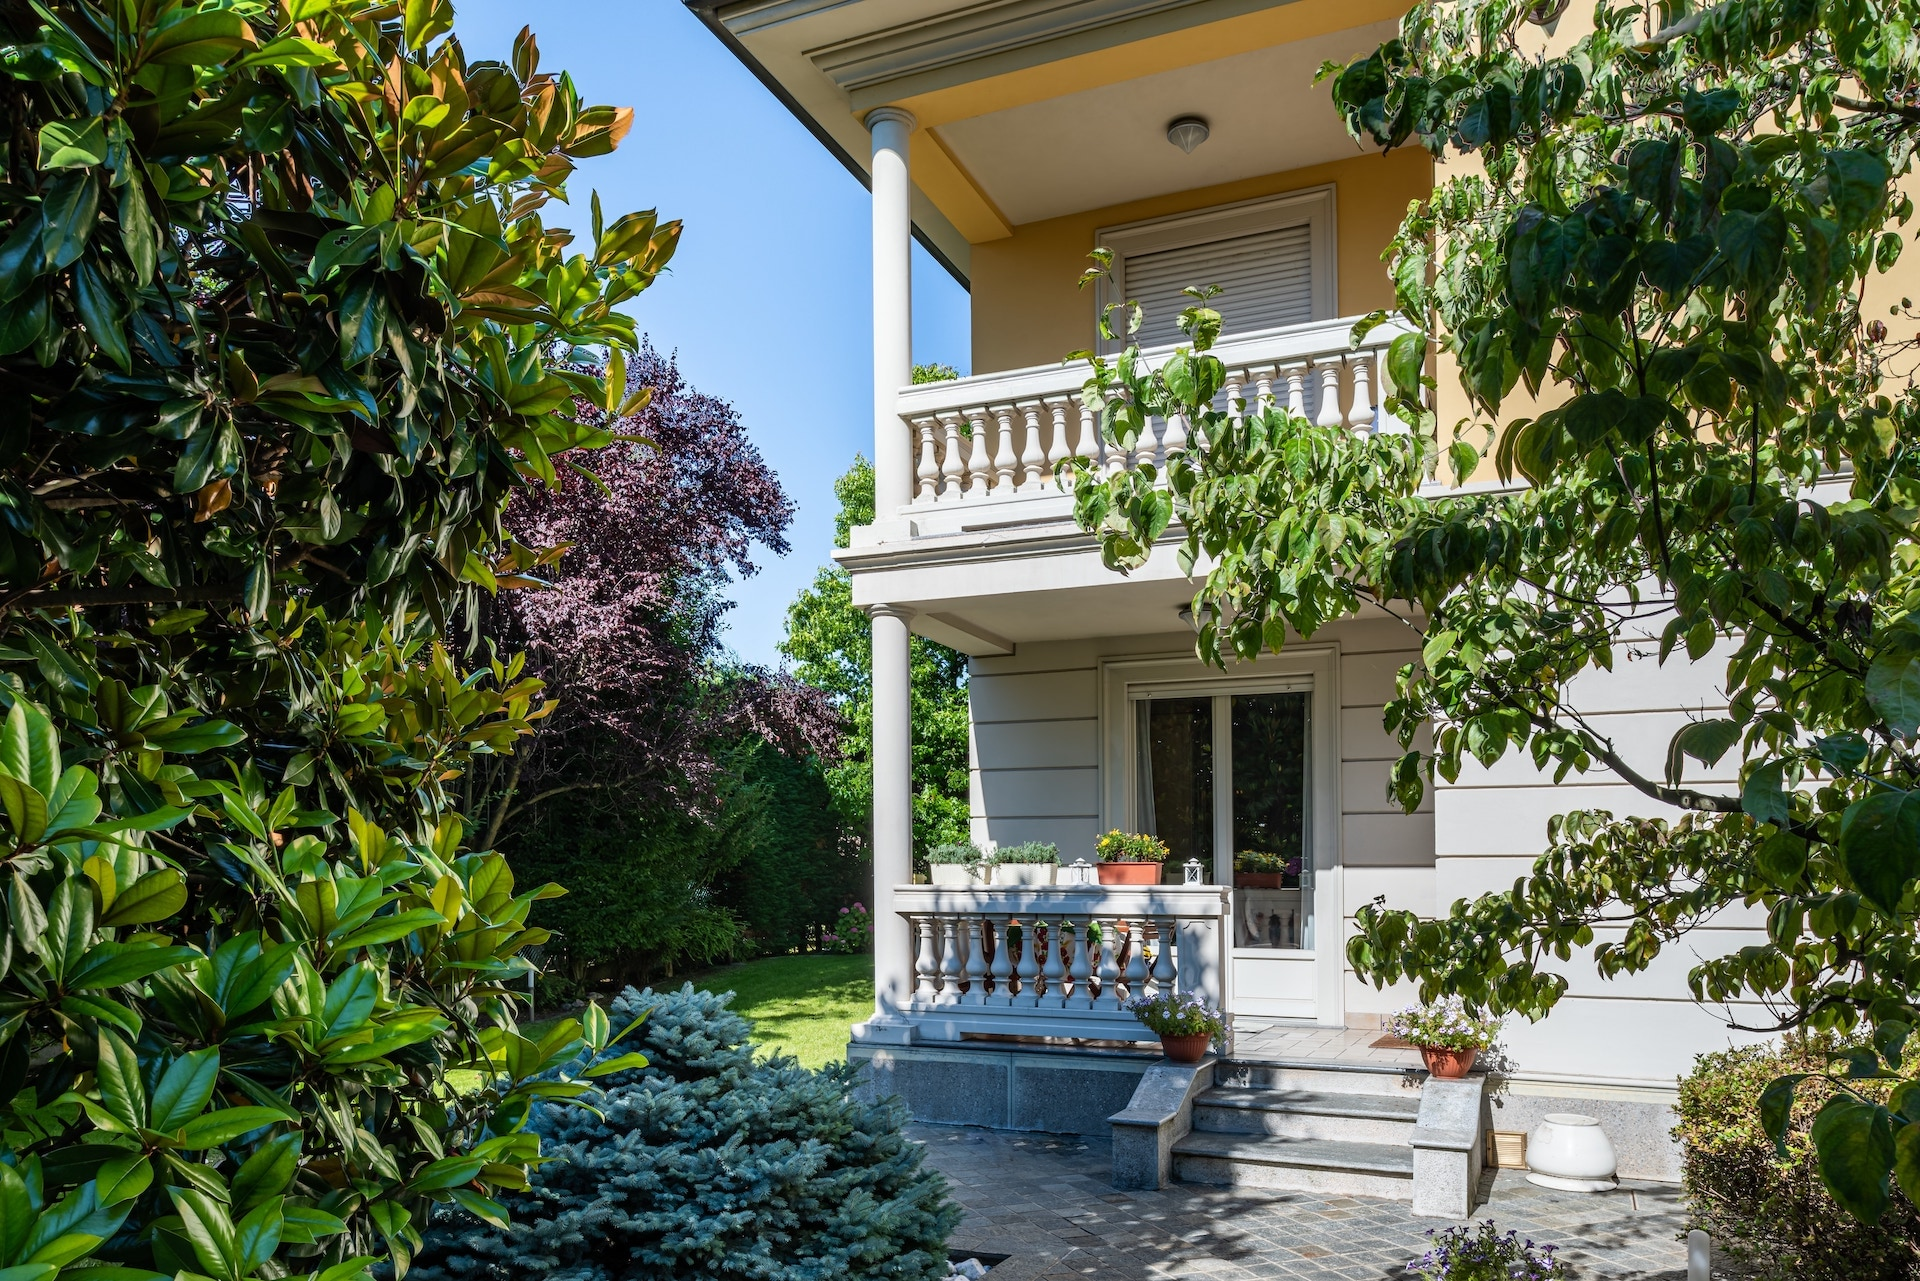 Villa Bifamilaire, Via D. L. Monza 31 Saronno-HDR-3